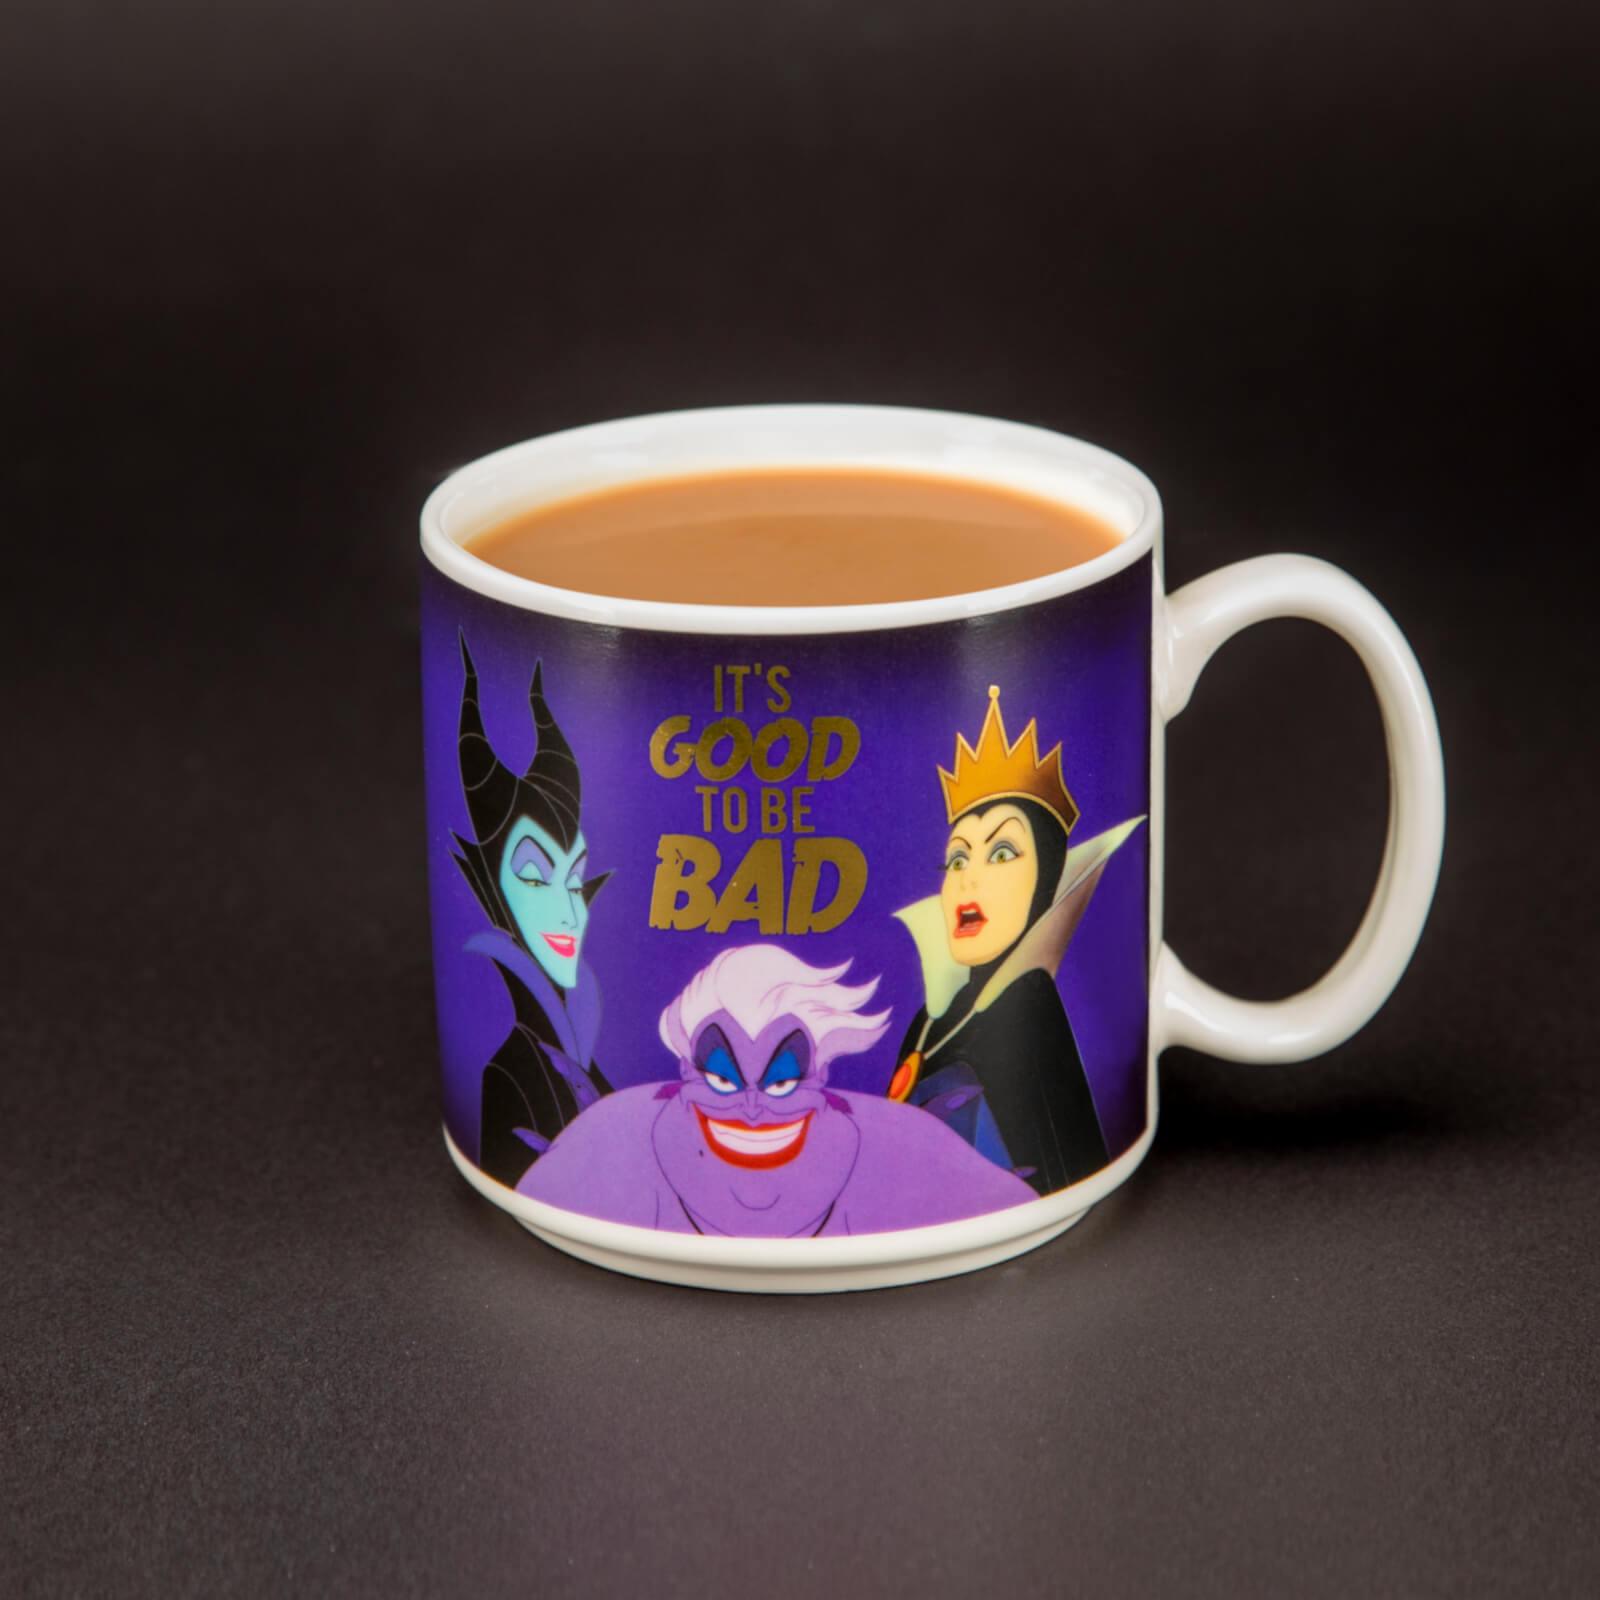 Image of Disney Villains 'It's Good To Be Bad' Mug